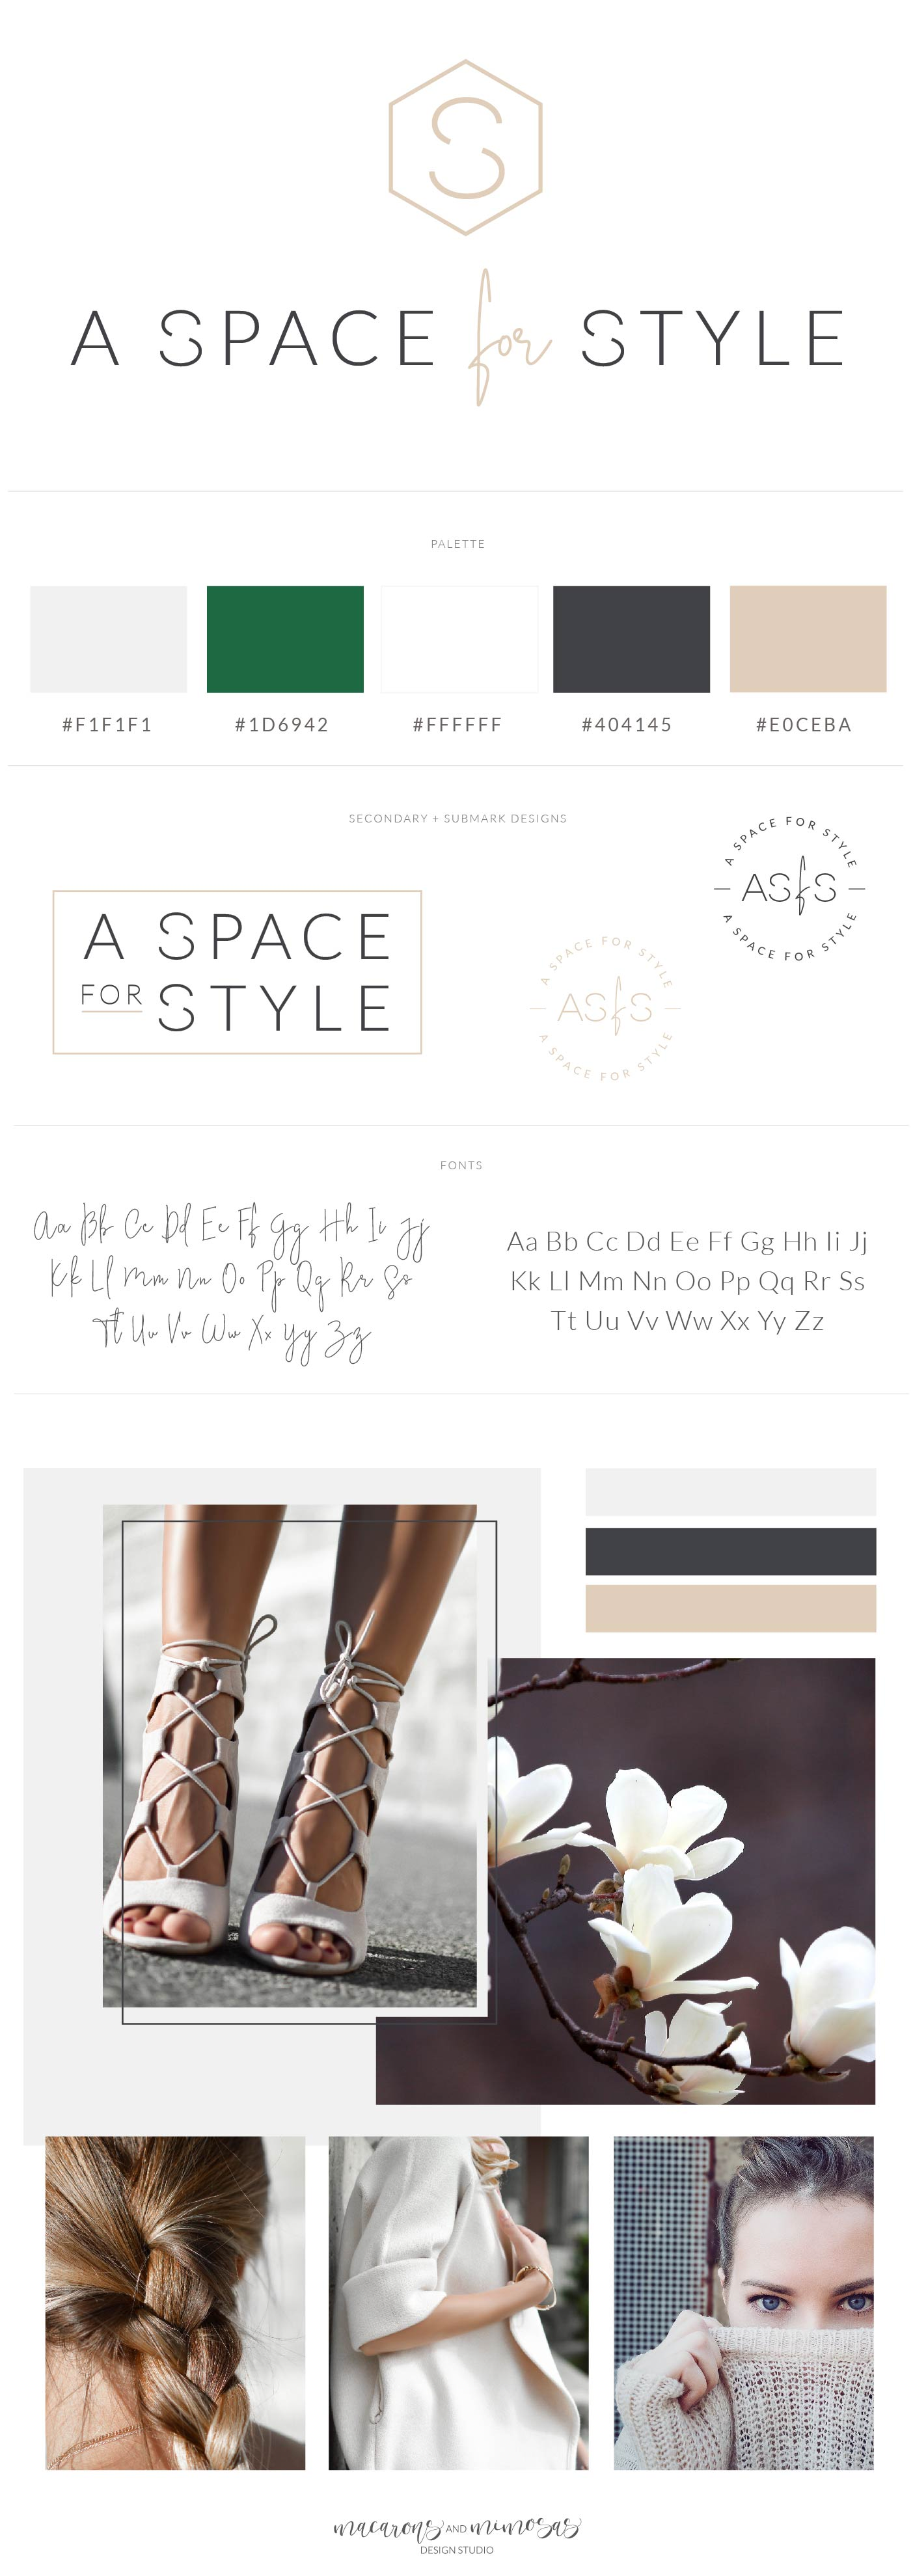 Fashion Logo Design, Branding Kit - monogram, intials logo design, beauty blog brand, handwritten logo, customizable logo, modern logo, mid century logo design